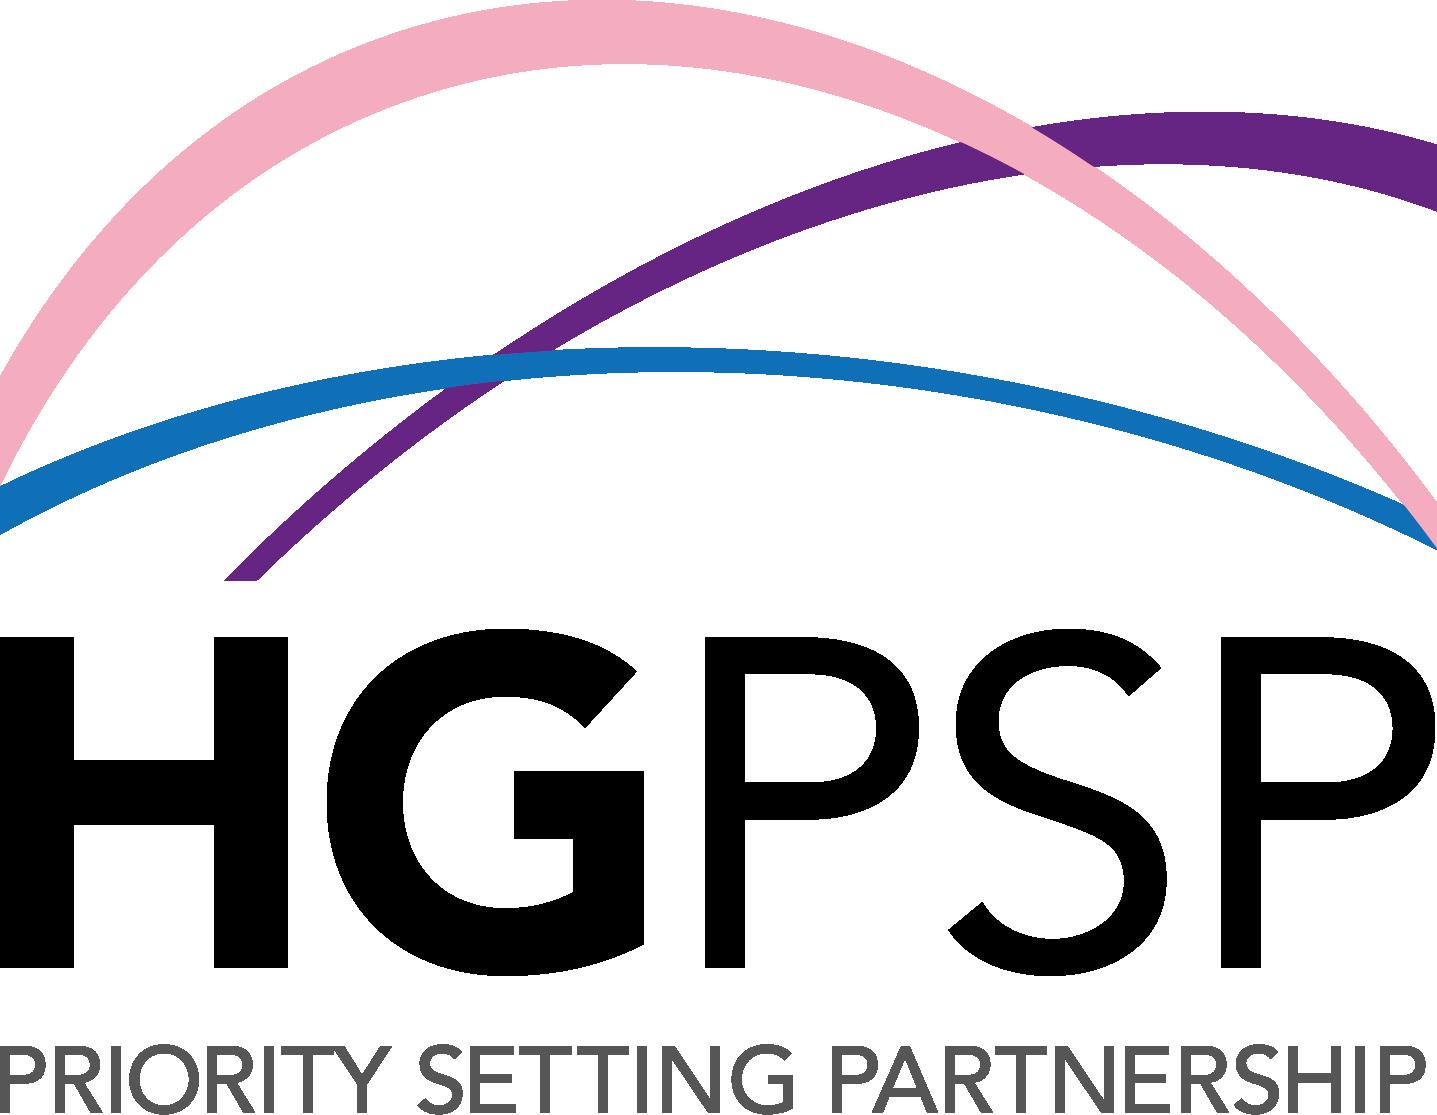 HGpsp logo.png